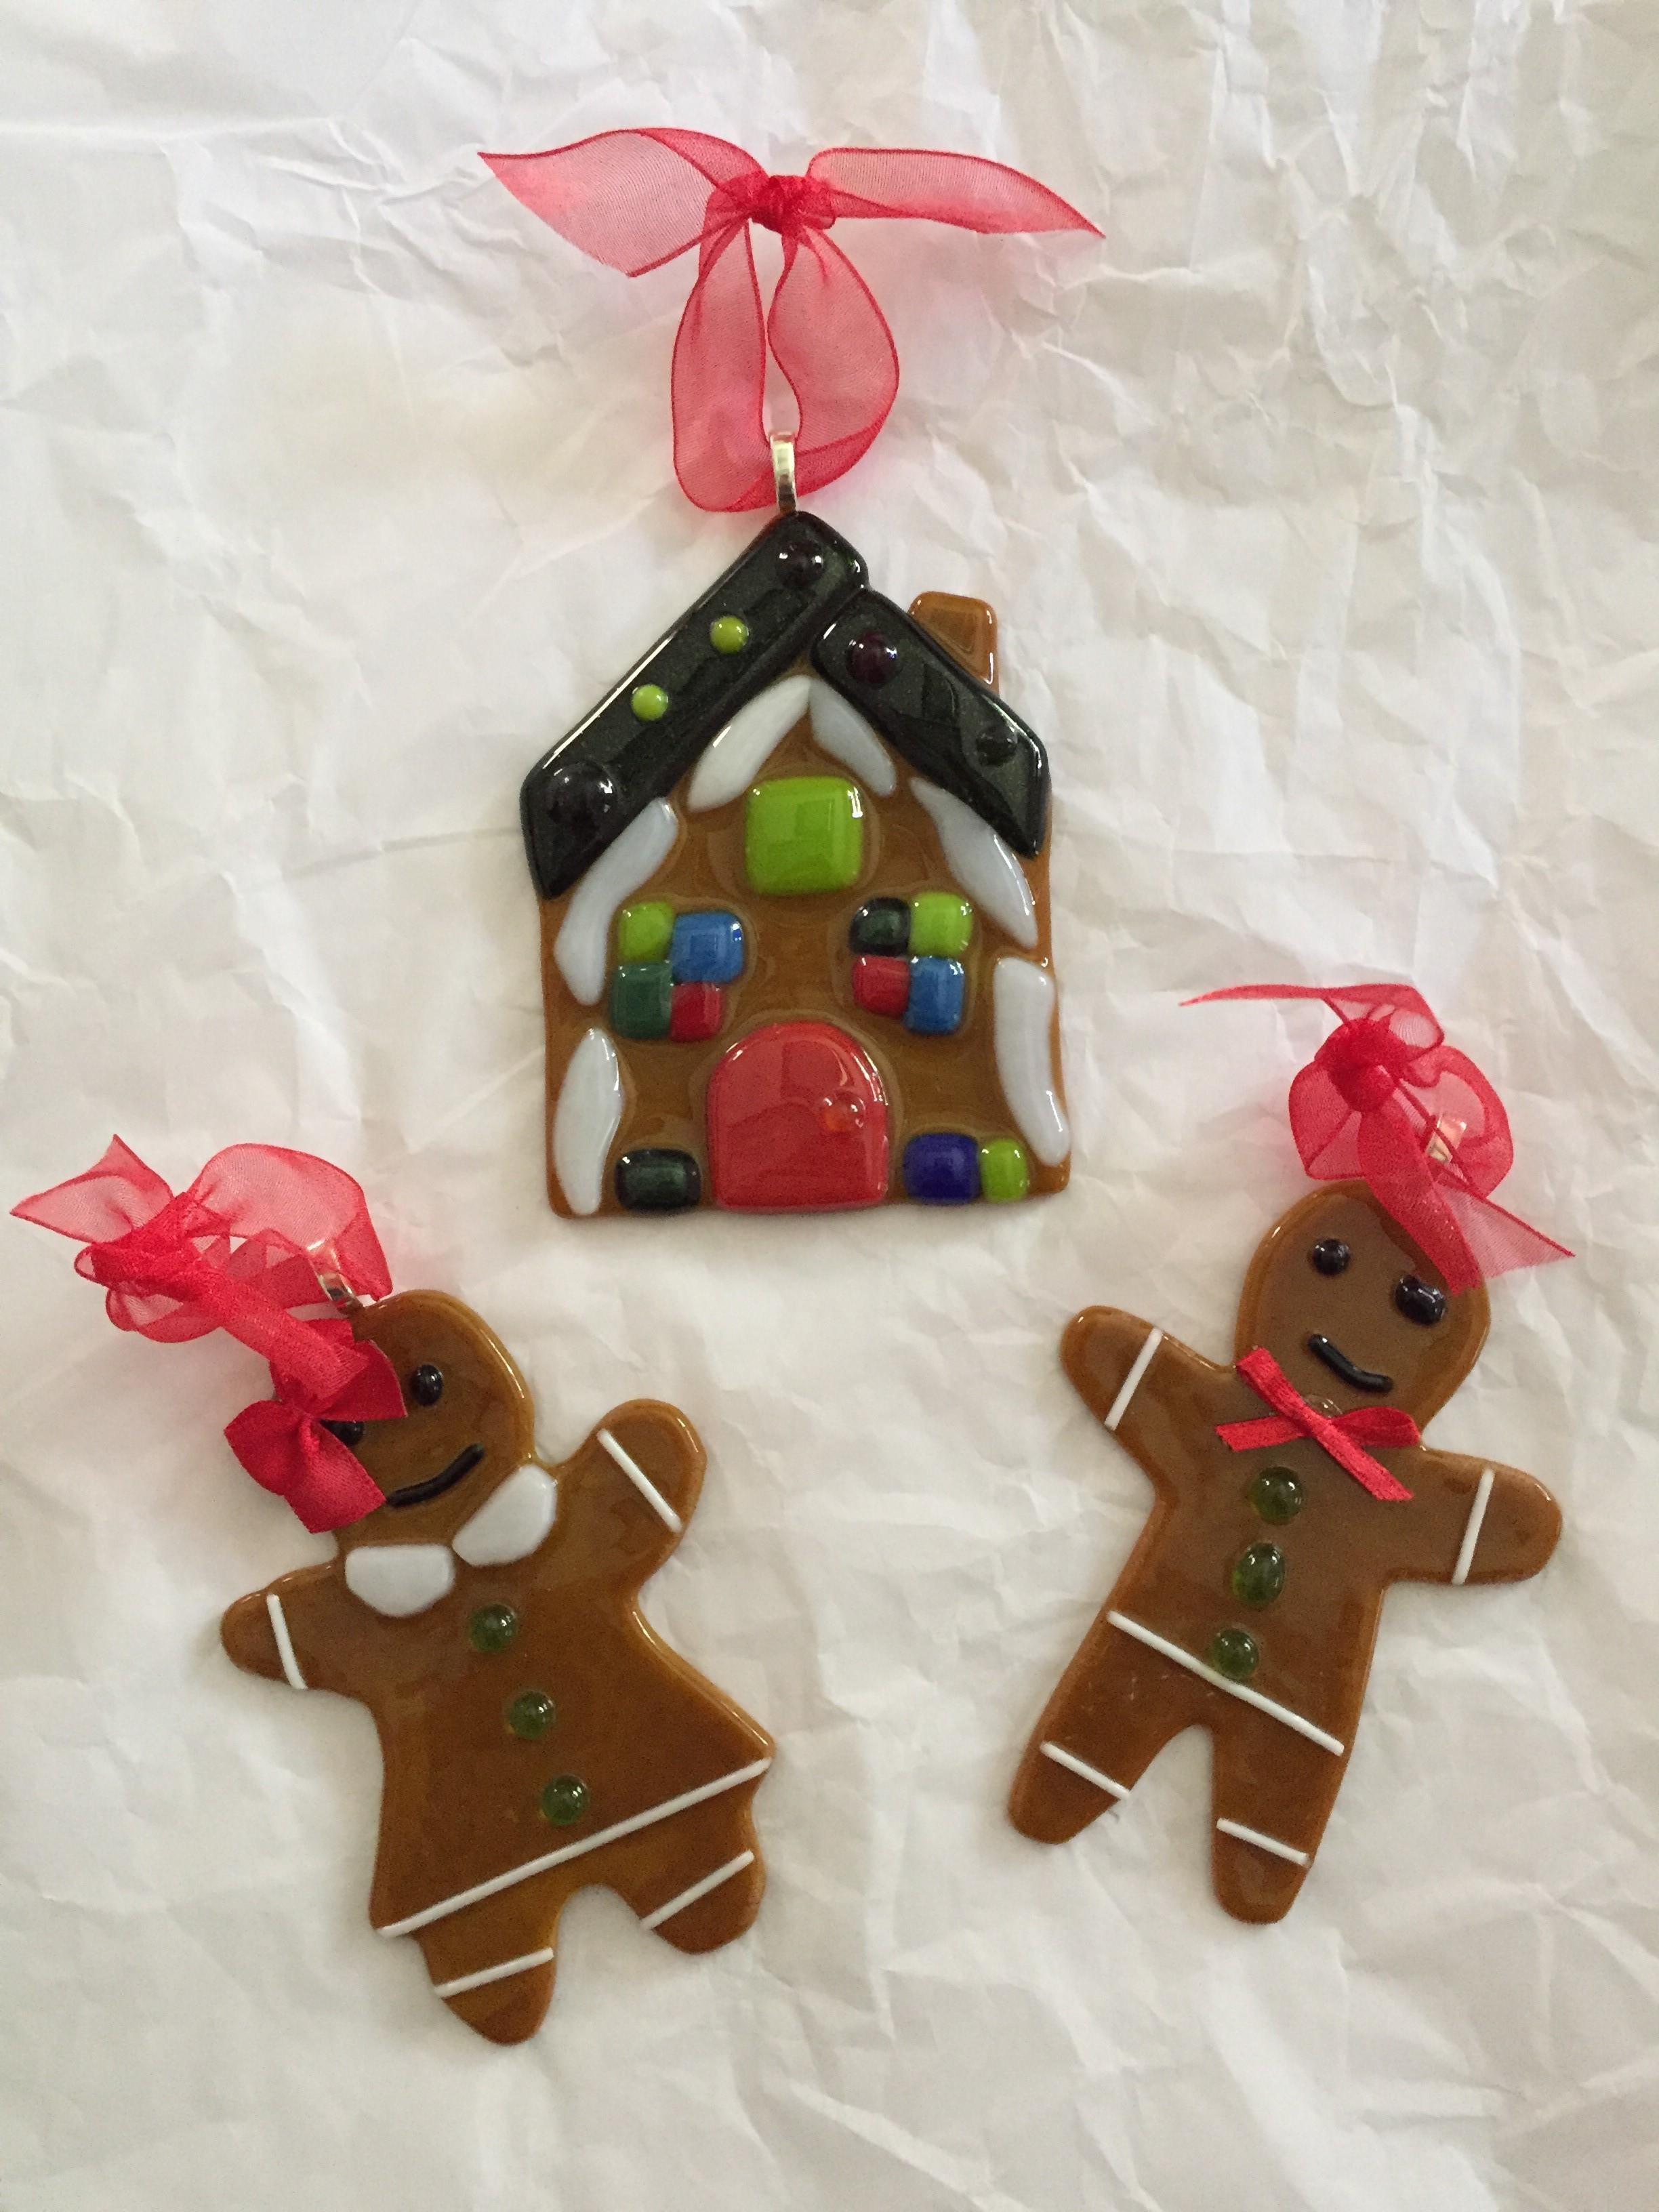 2017 Gingerbread Ornaments 2.jpg